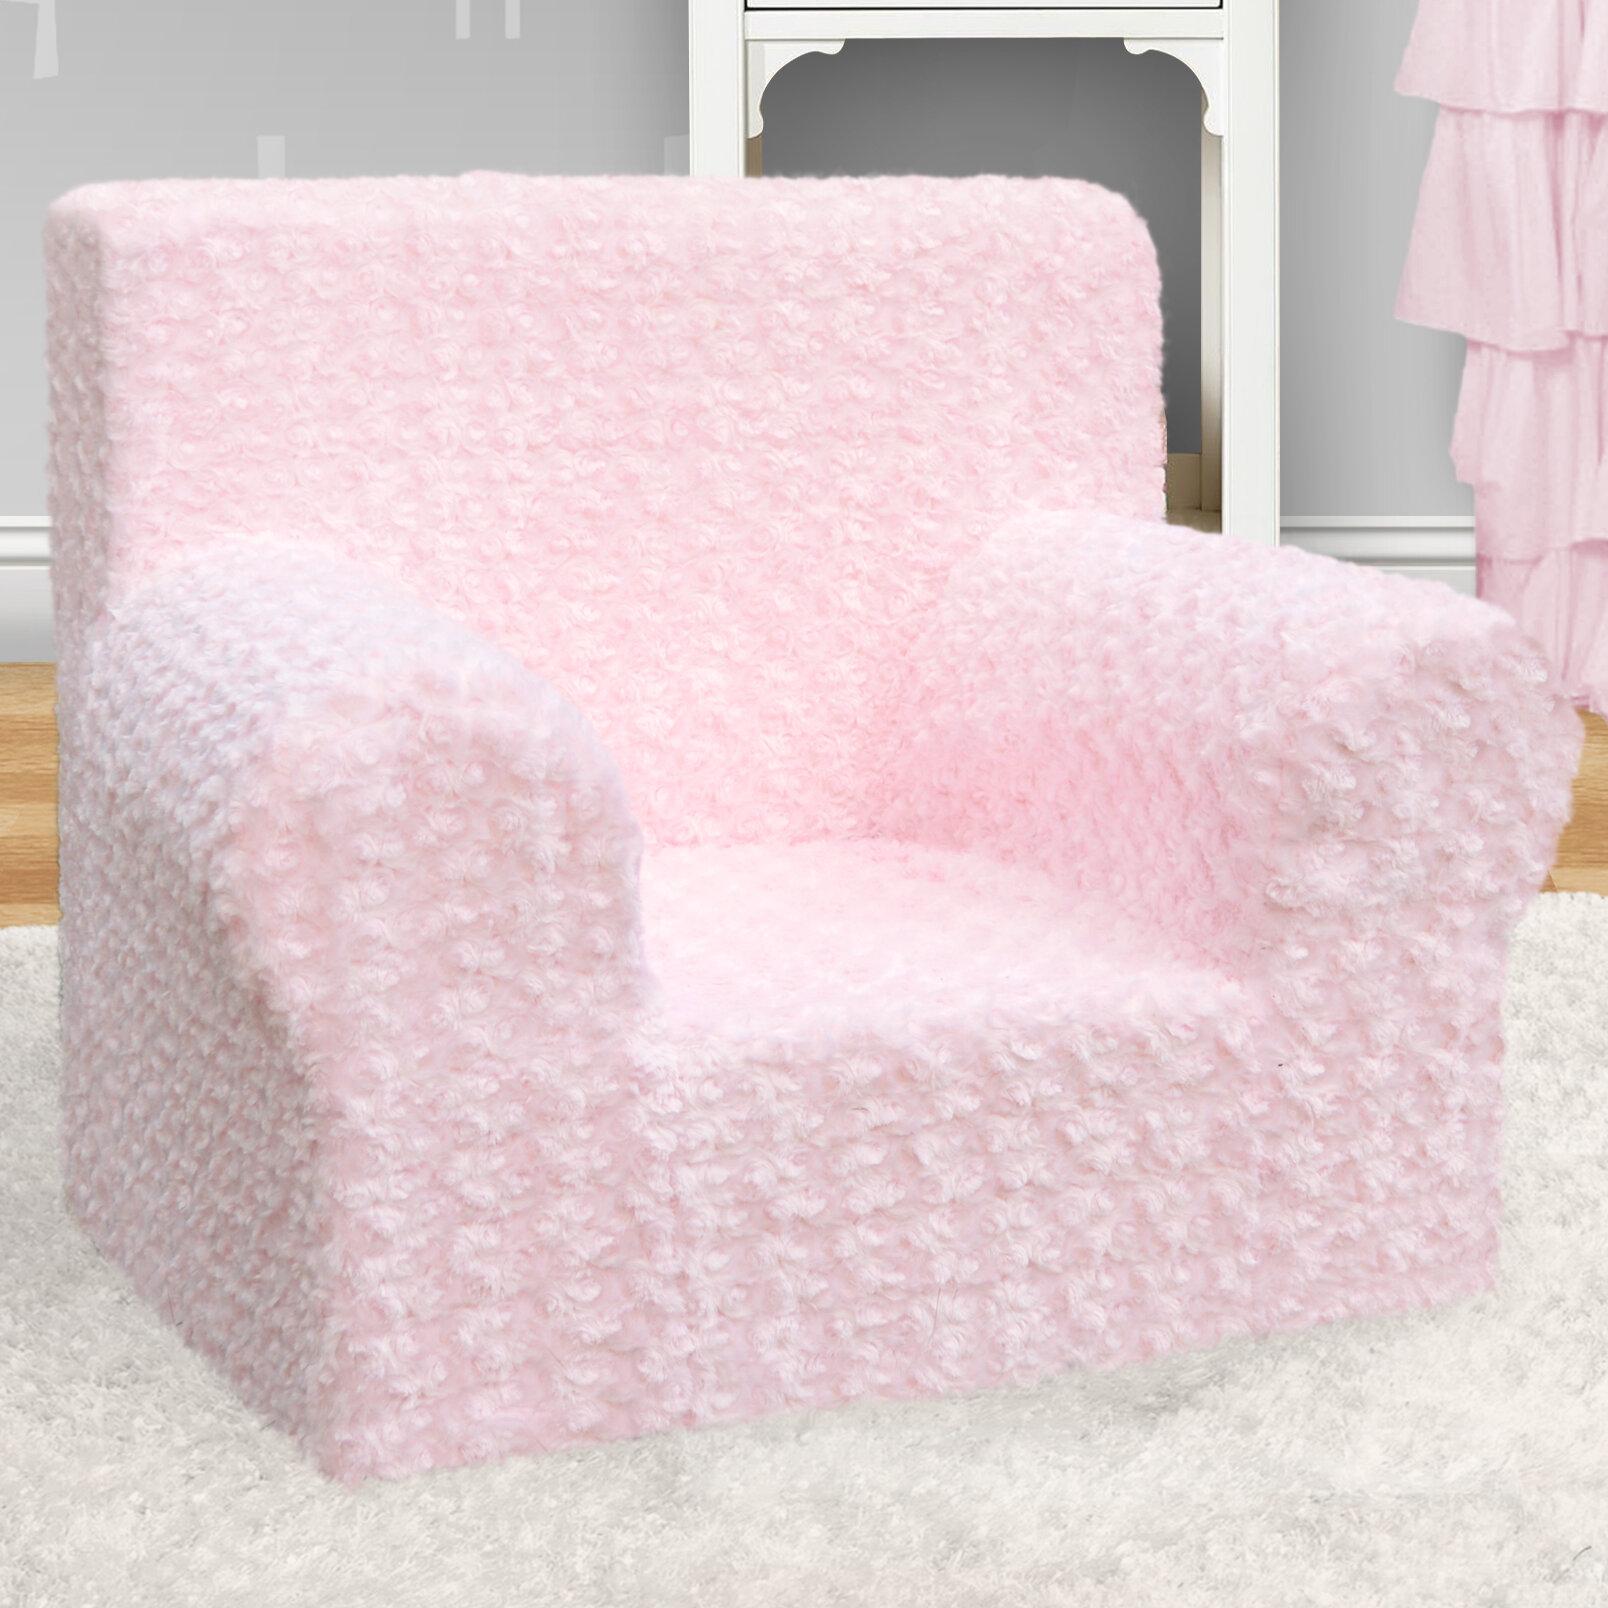 Superbe Kangaroo Trading Company Weston Rose Cuddle Grab N Go Kids Foam Chair |  Wayfair